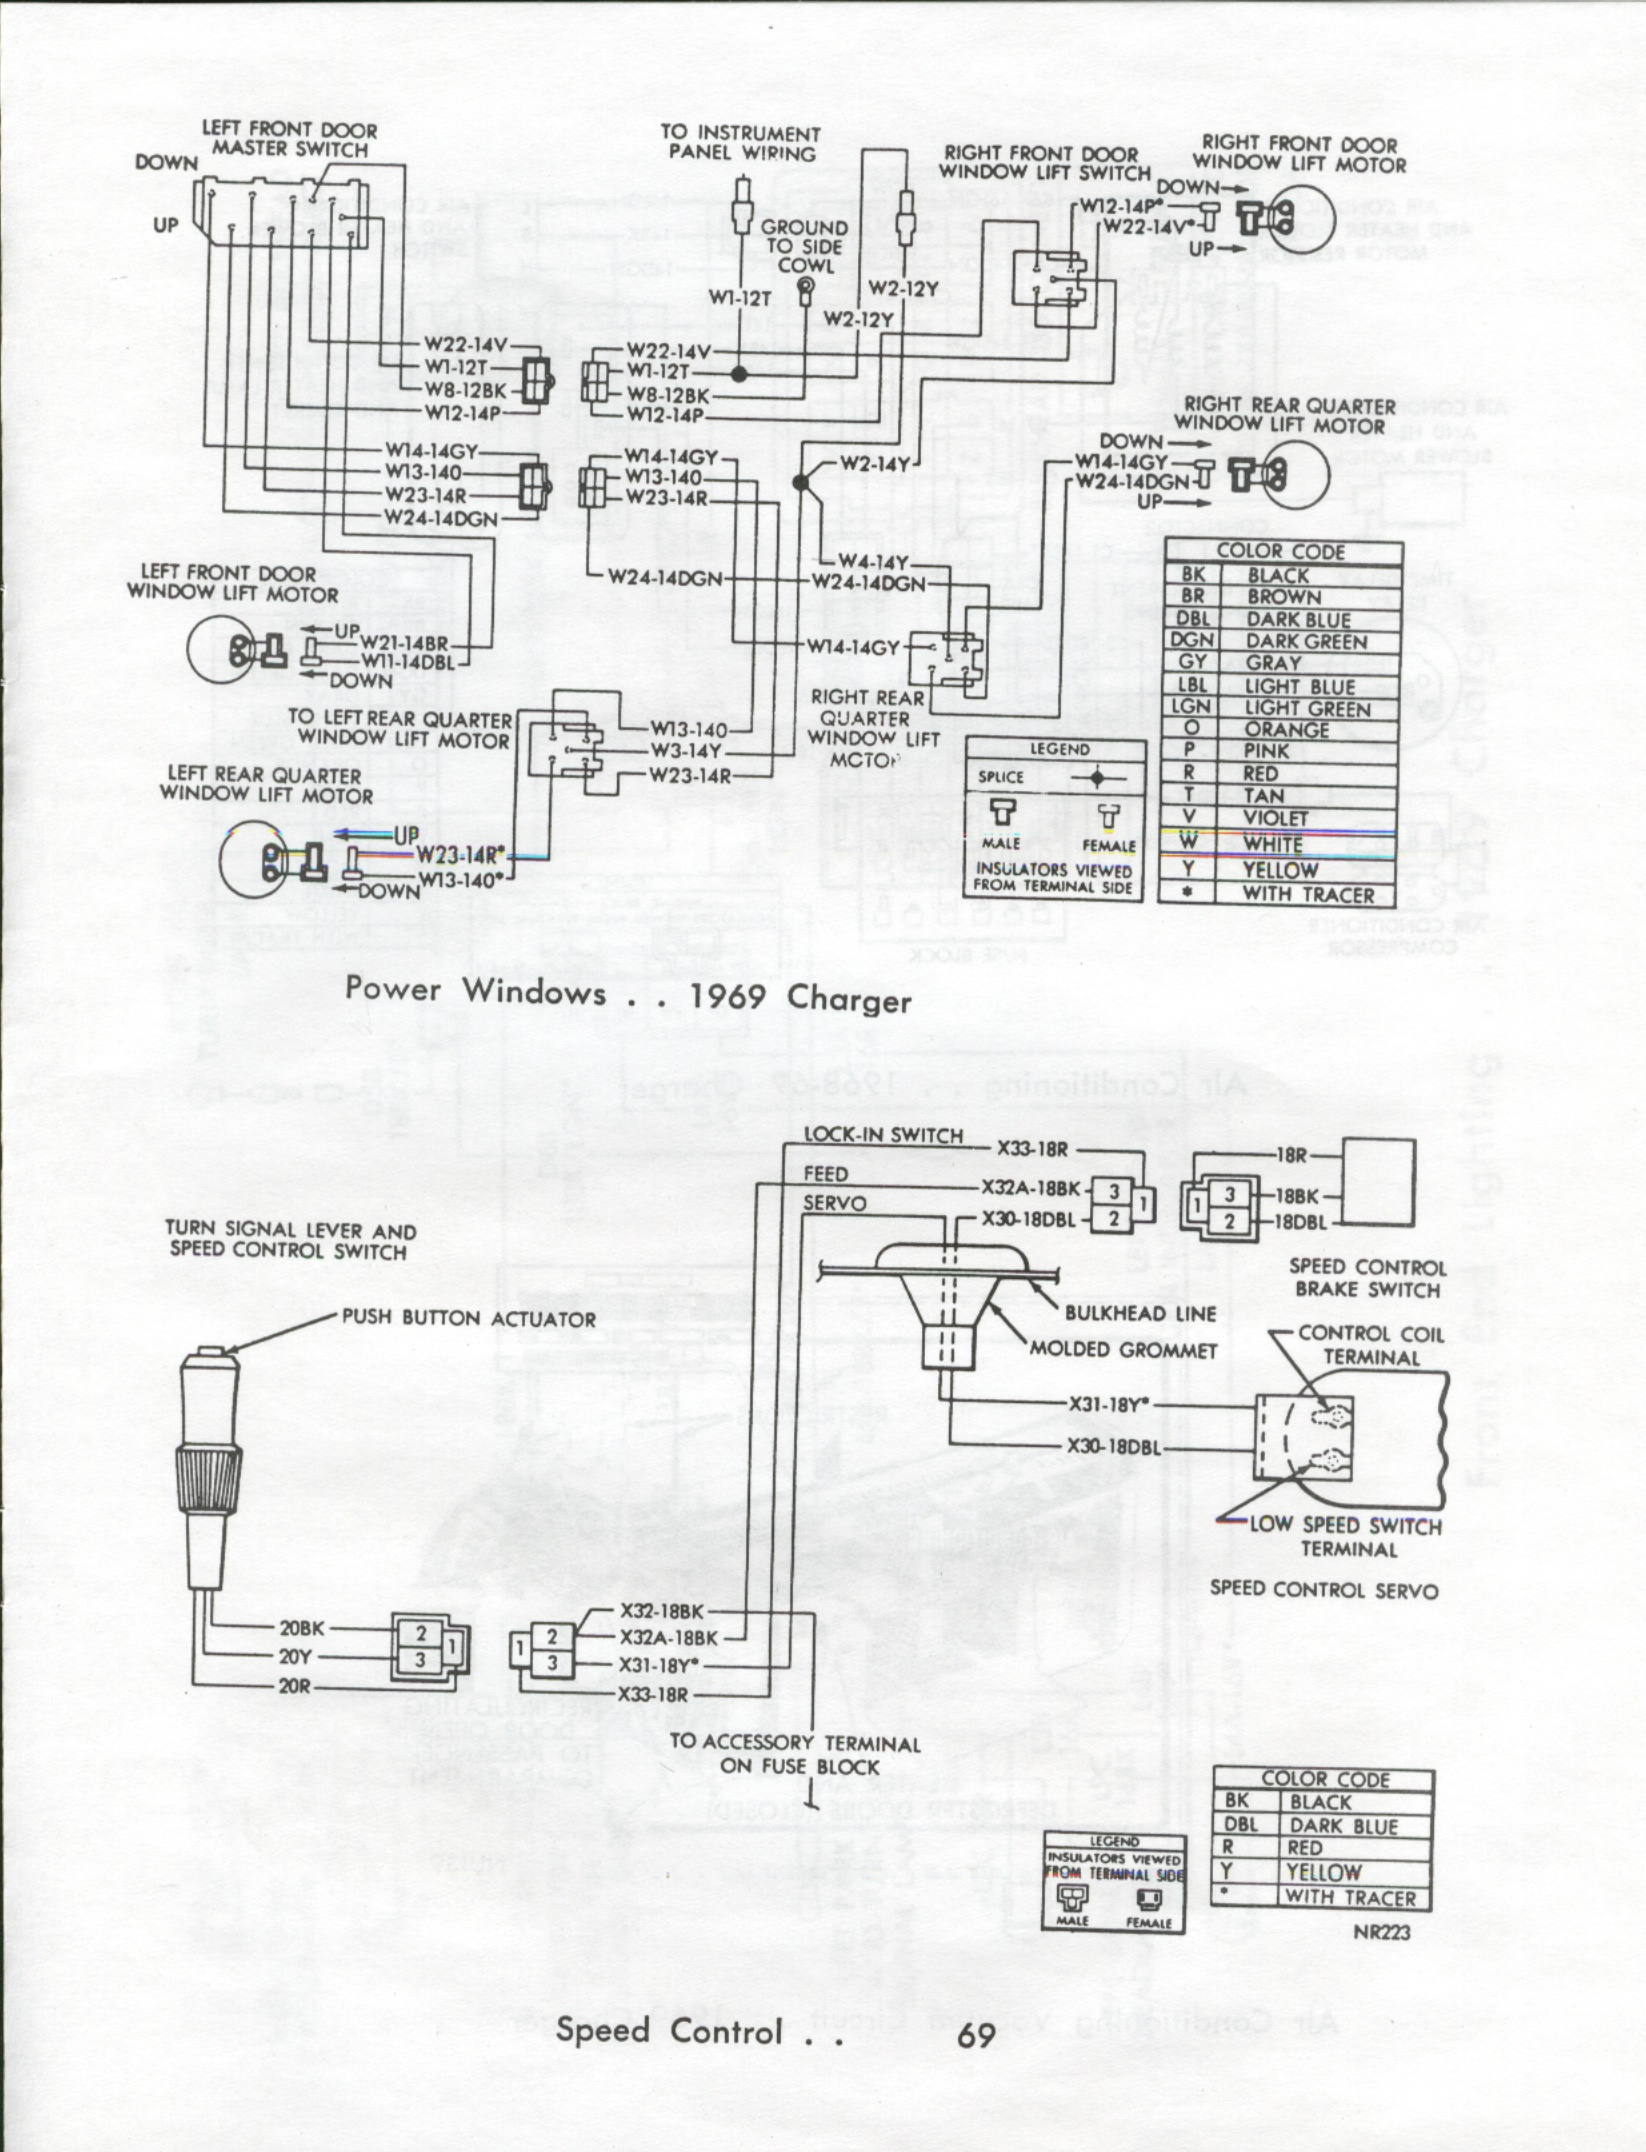 1968 Dodge Radio Wiring Diagram 1969 Gto Wiring Harness Clubcar Ati Loro Jeanjaures37 Fr